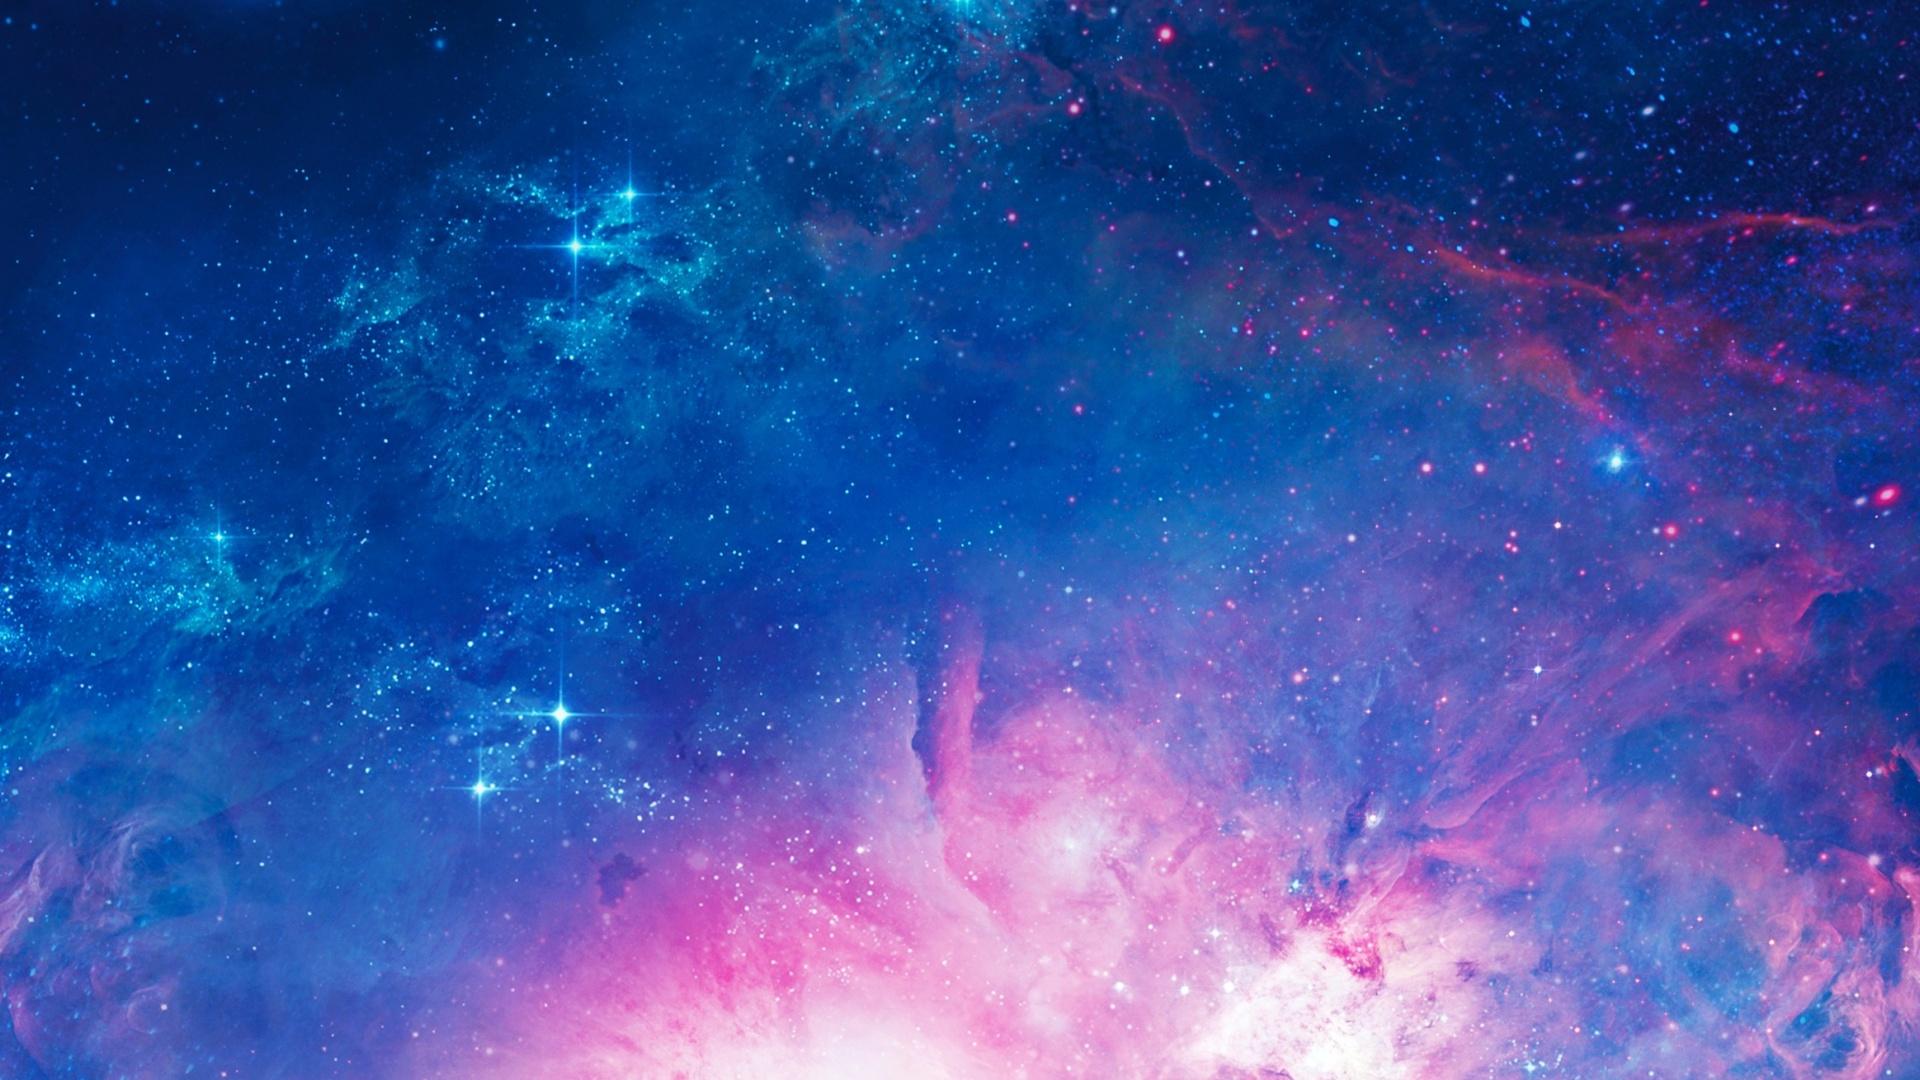 Free Download Guardians Of The Galaxy 4k Hd Desktop Wallpaper For